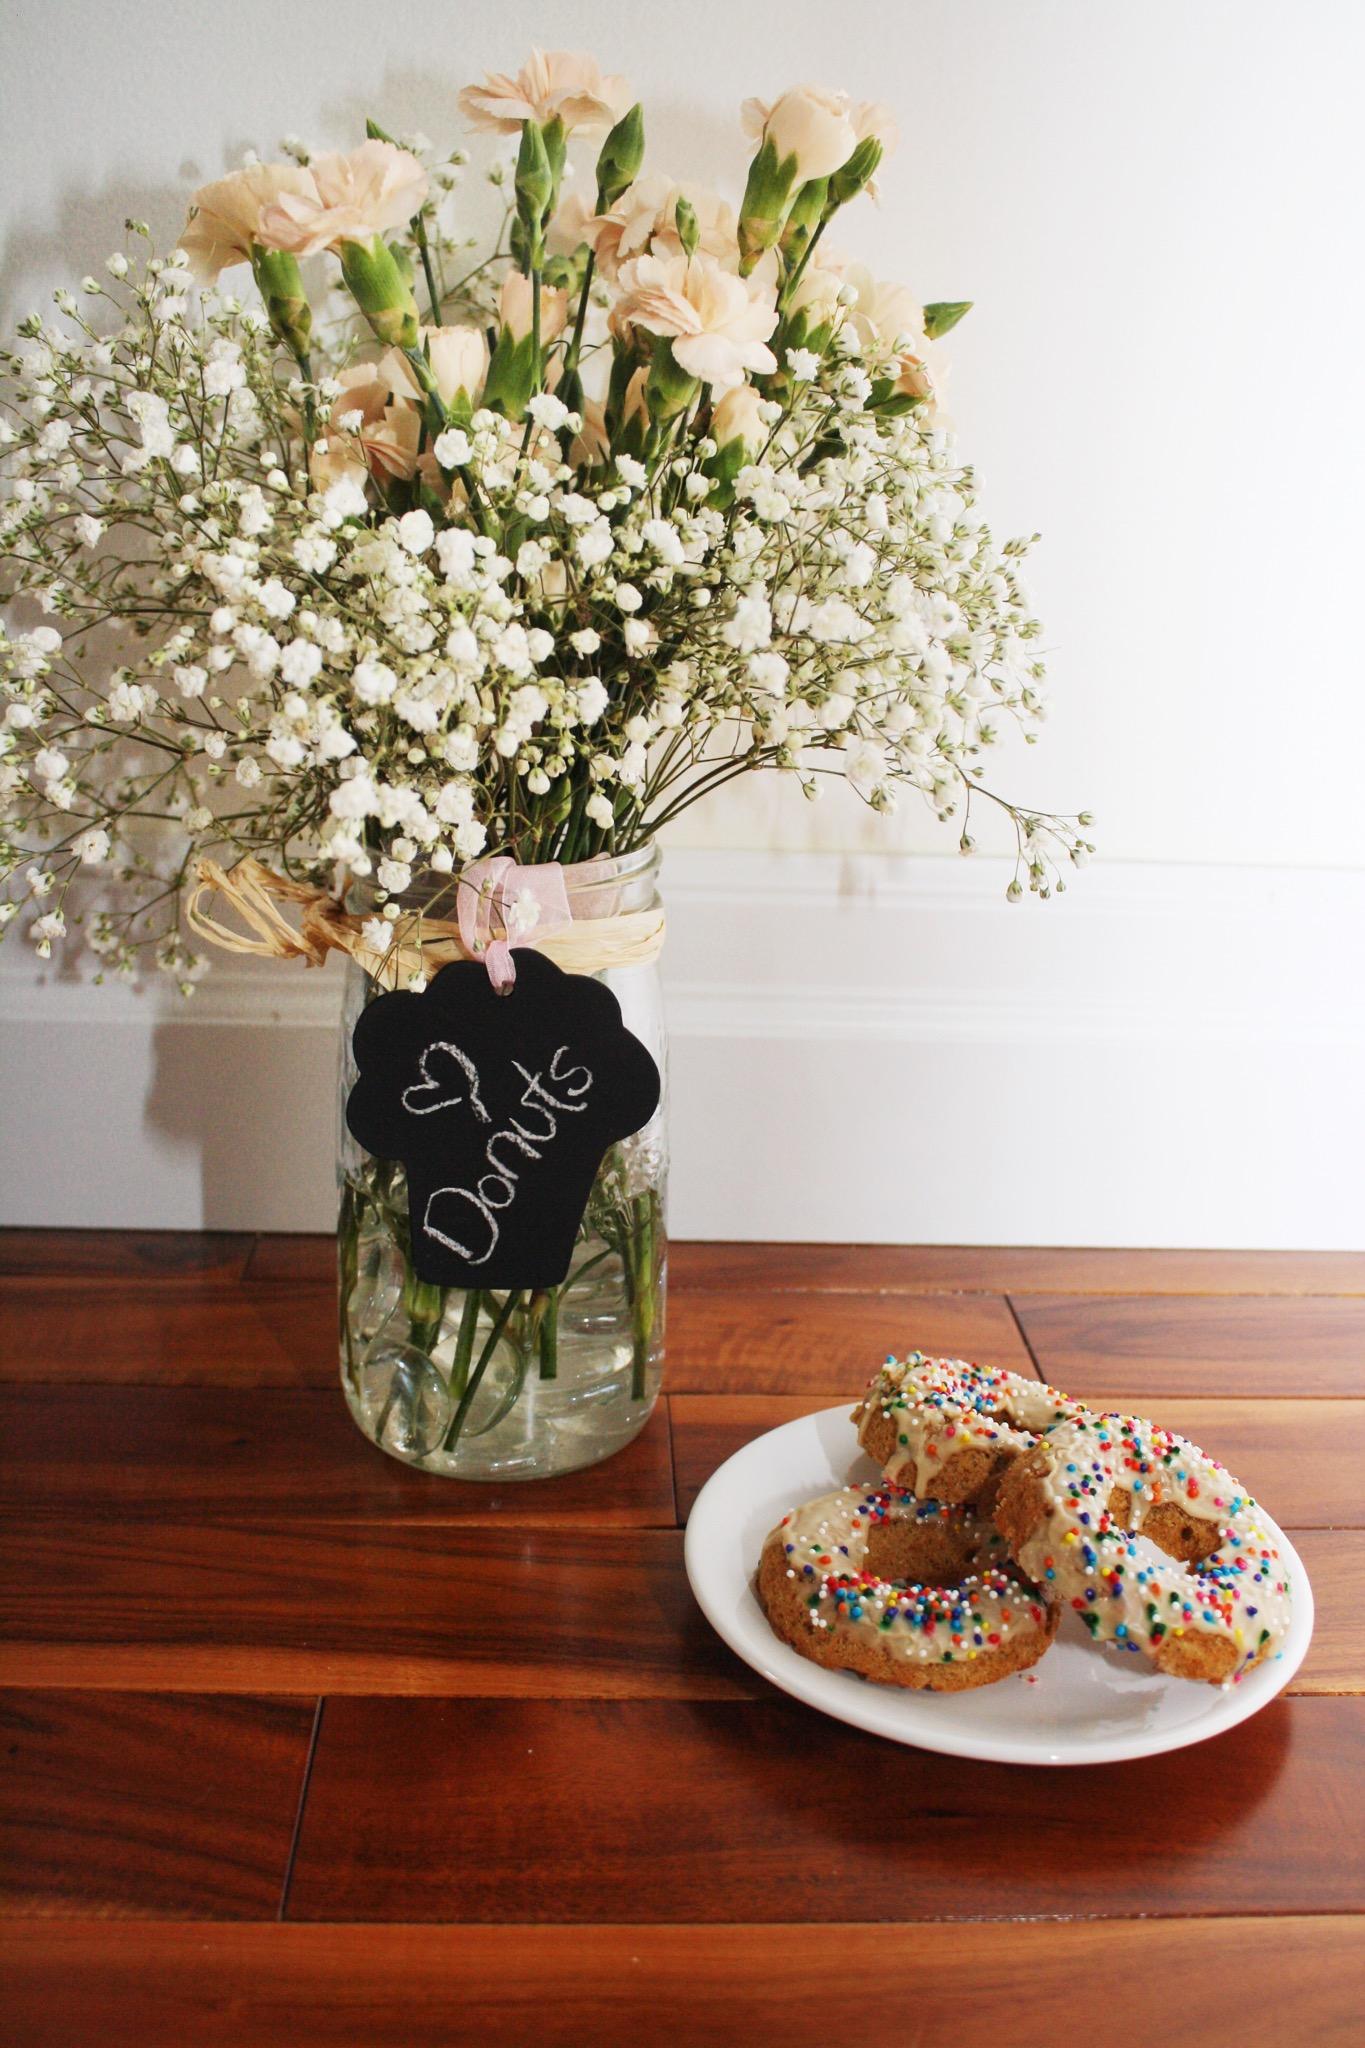 Vanilla Dream Donuts   Vegan (Dairy Free, Egg Free), Gluten Free, Oil Free, Refined Sugar Free